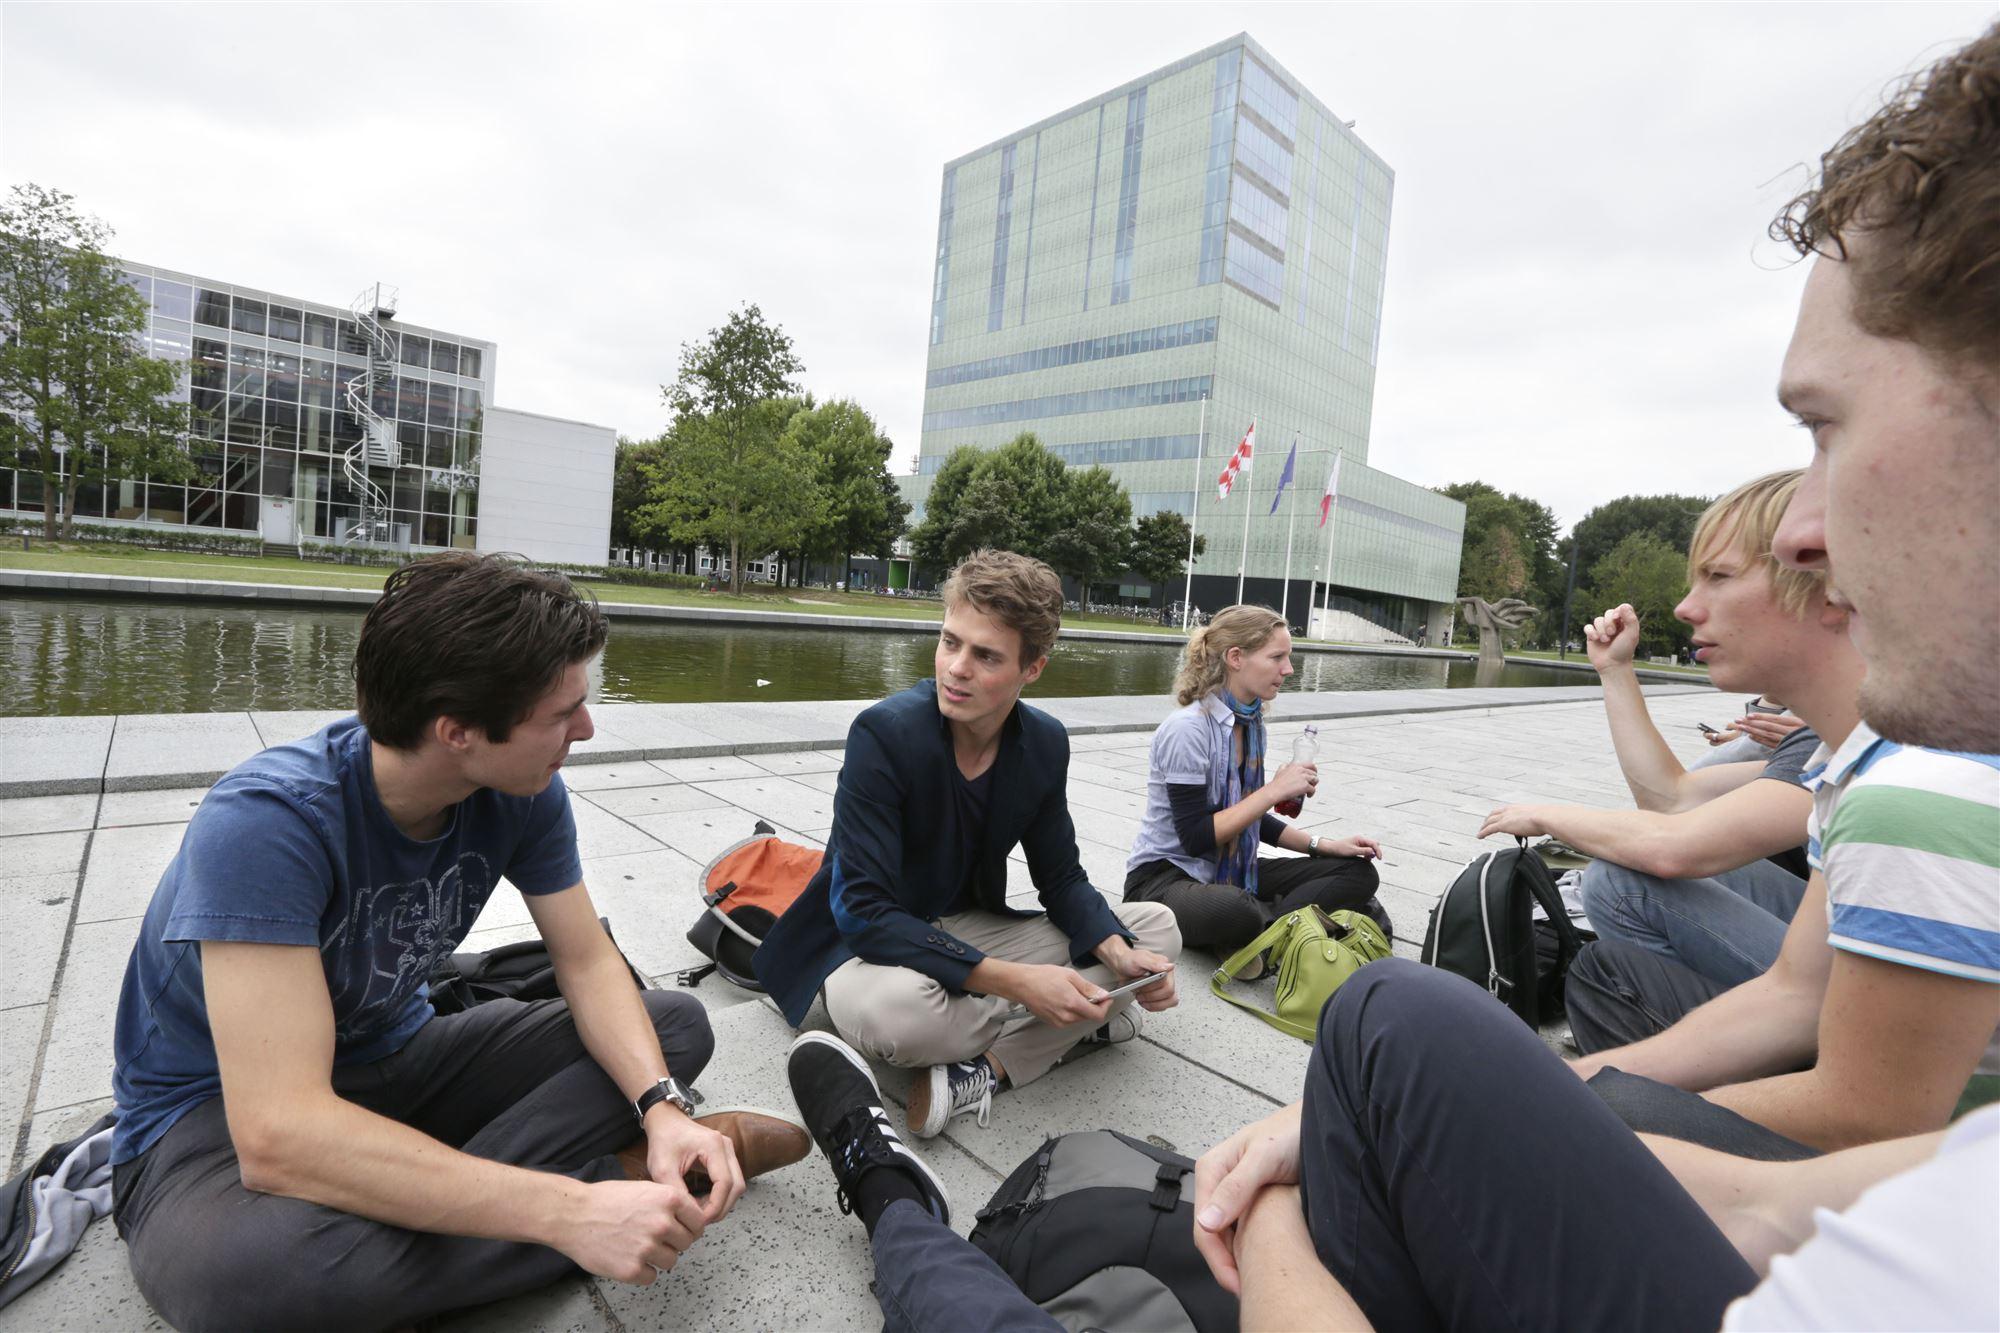 Studenten in Eindhoven